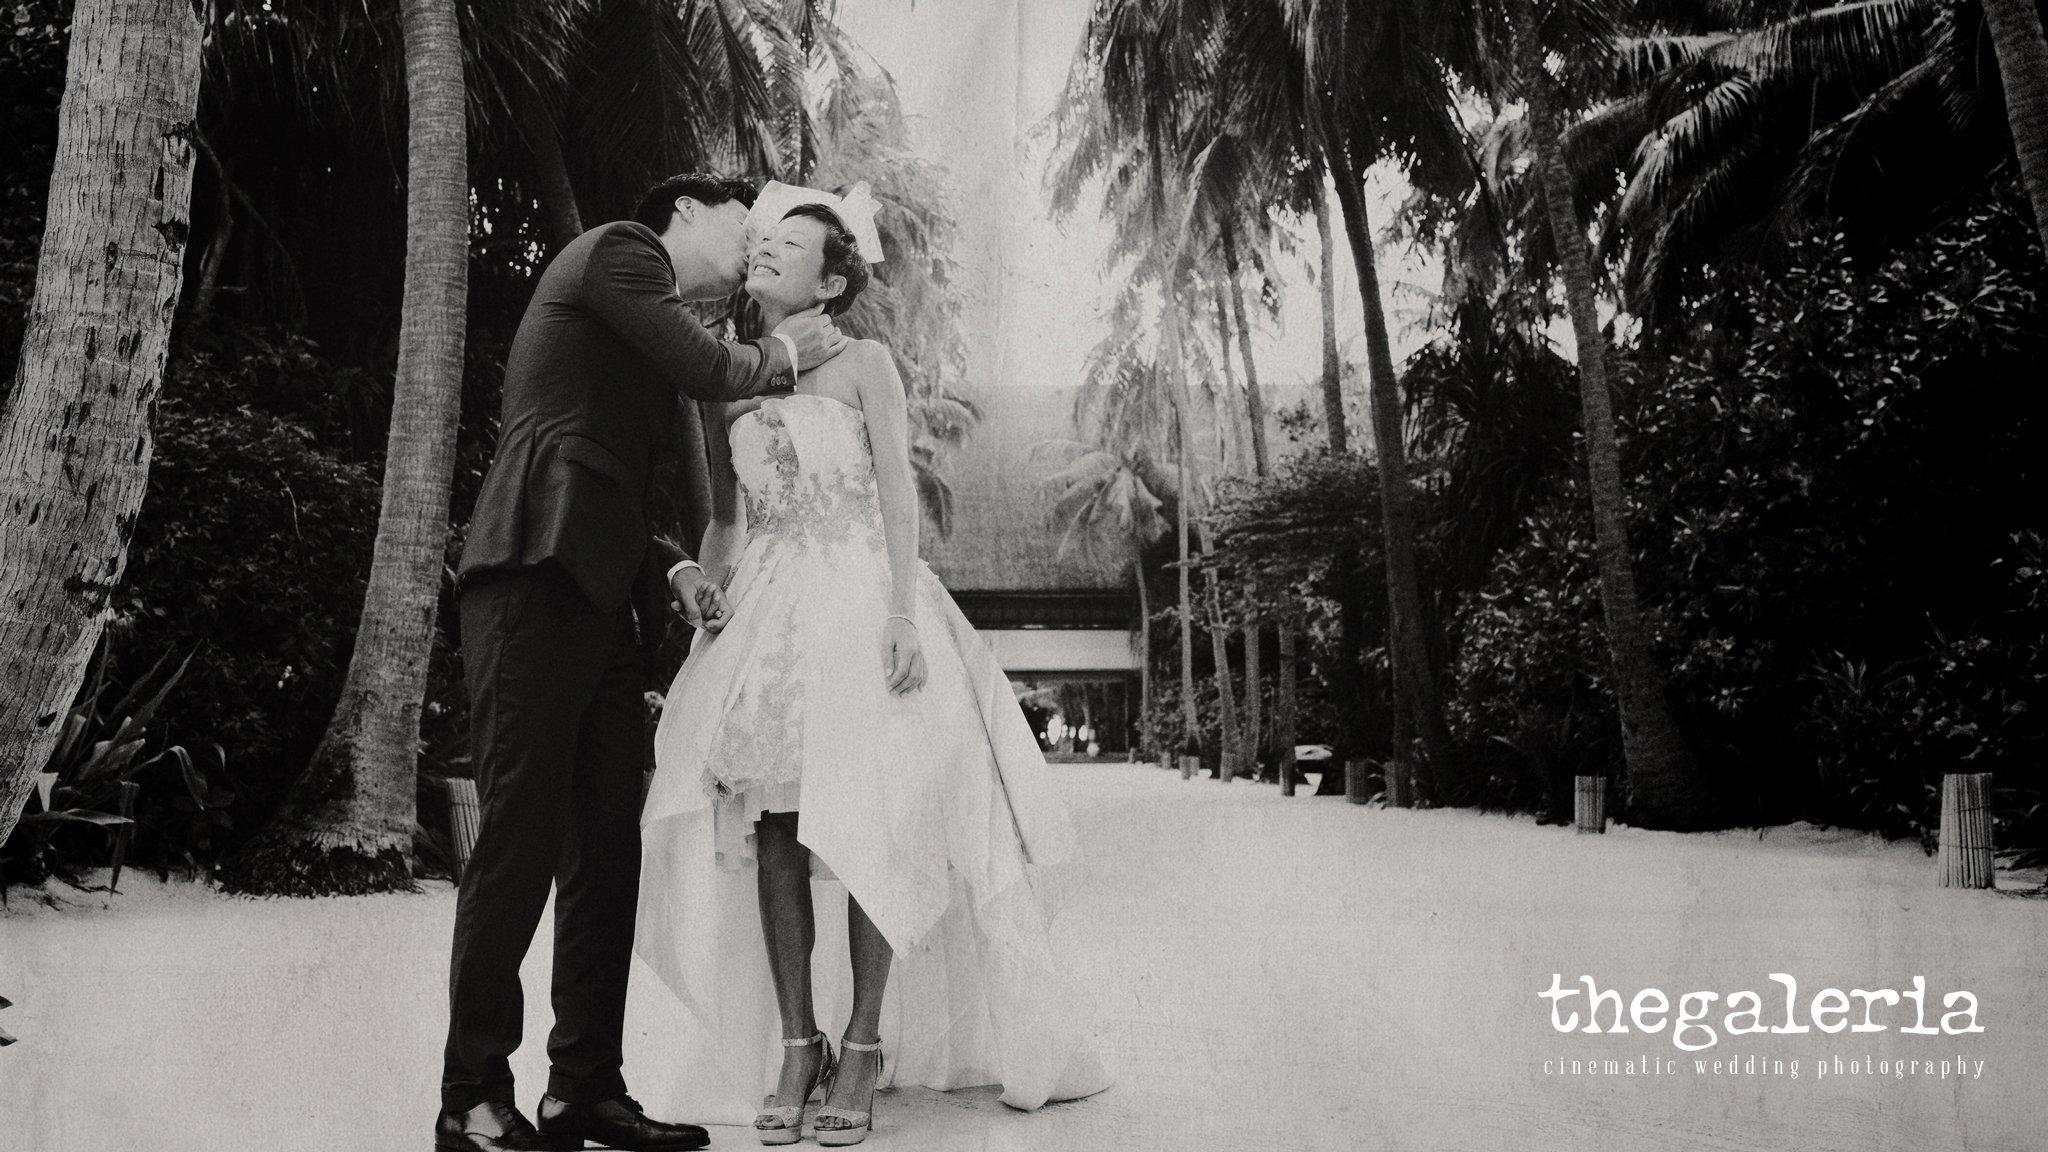 Maldives Pre-Wedding & Destination Weddings by Film Wedding Photographer Brian Ho from thegaleria